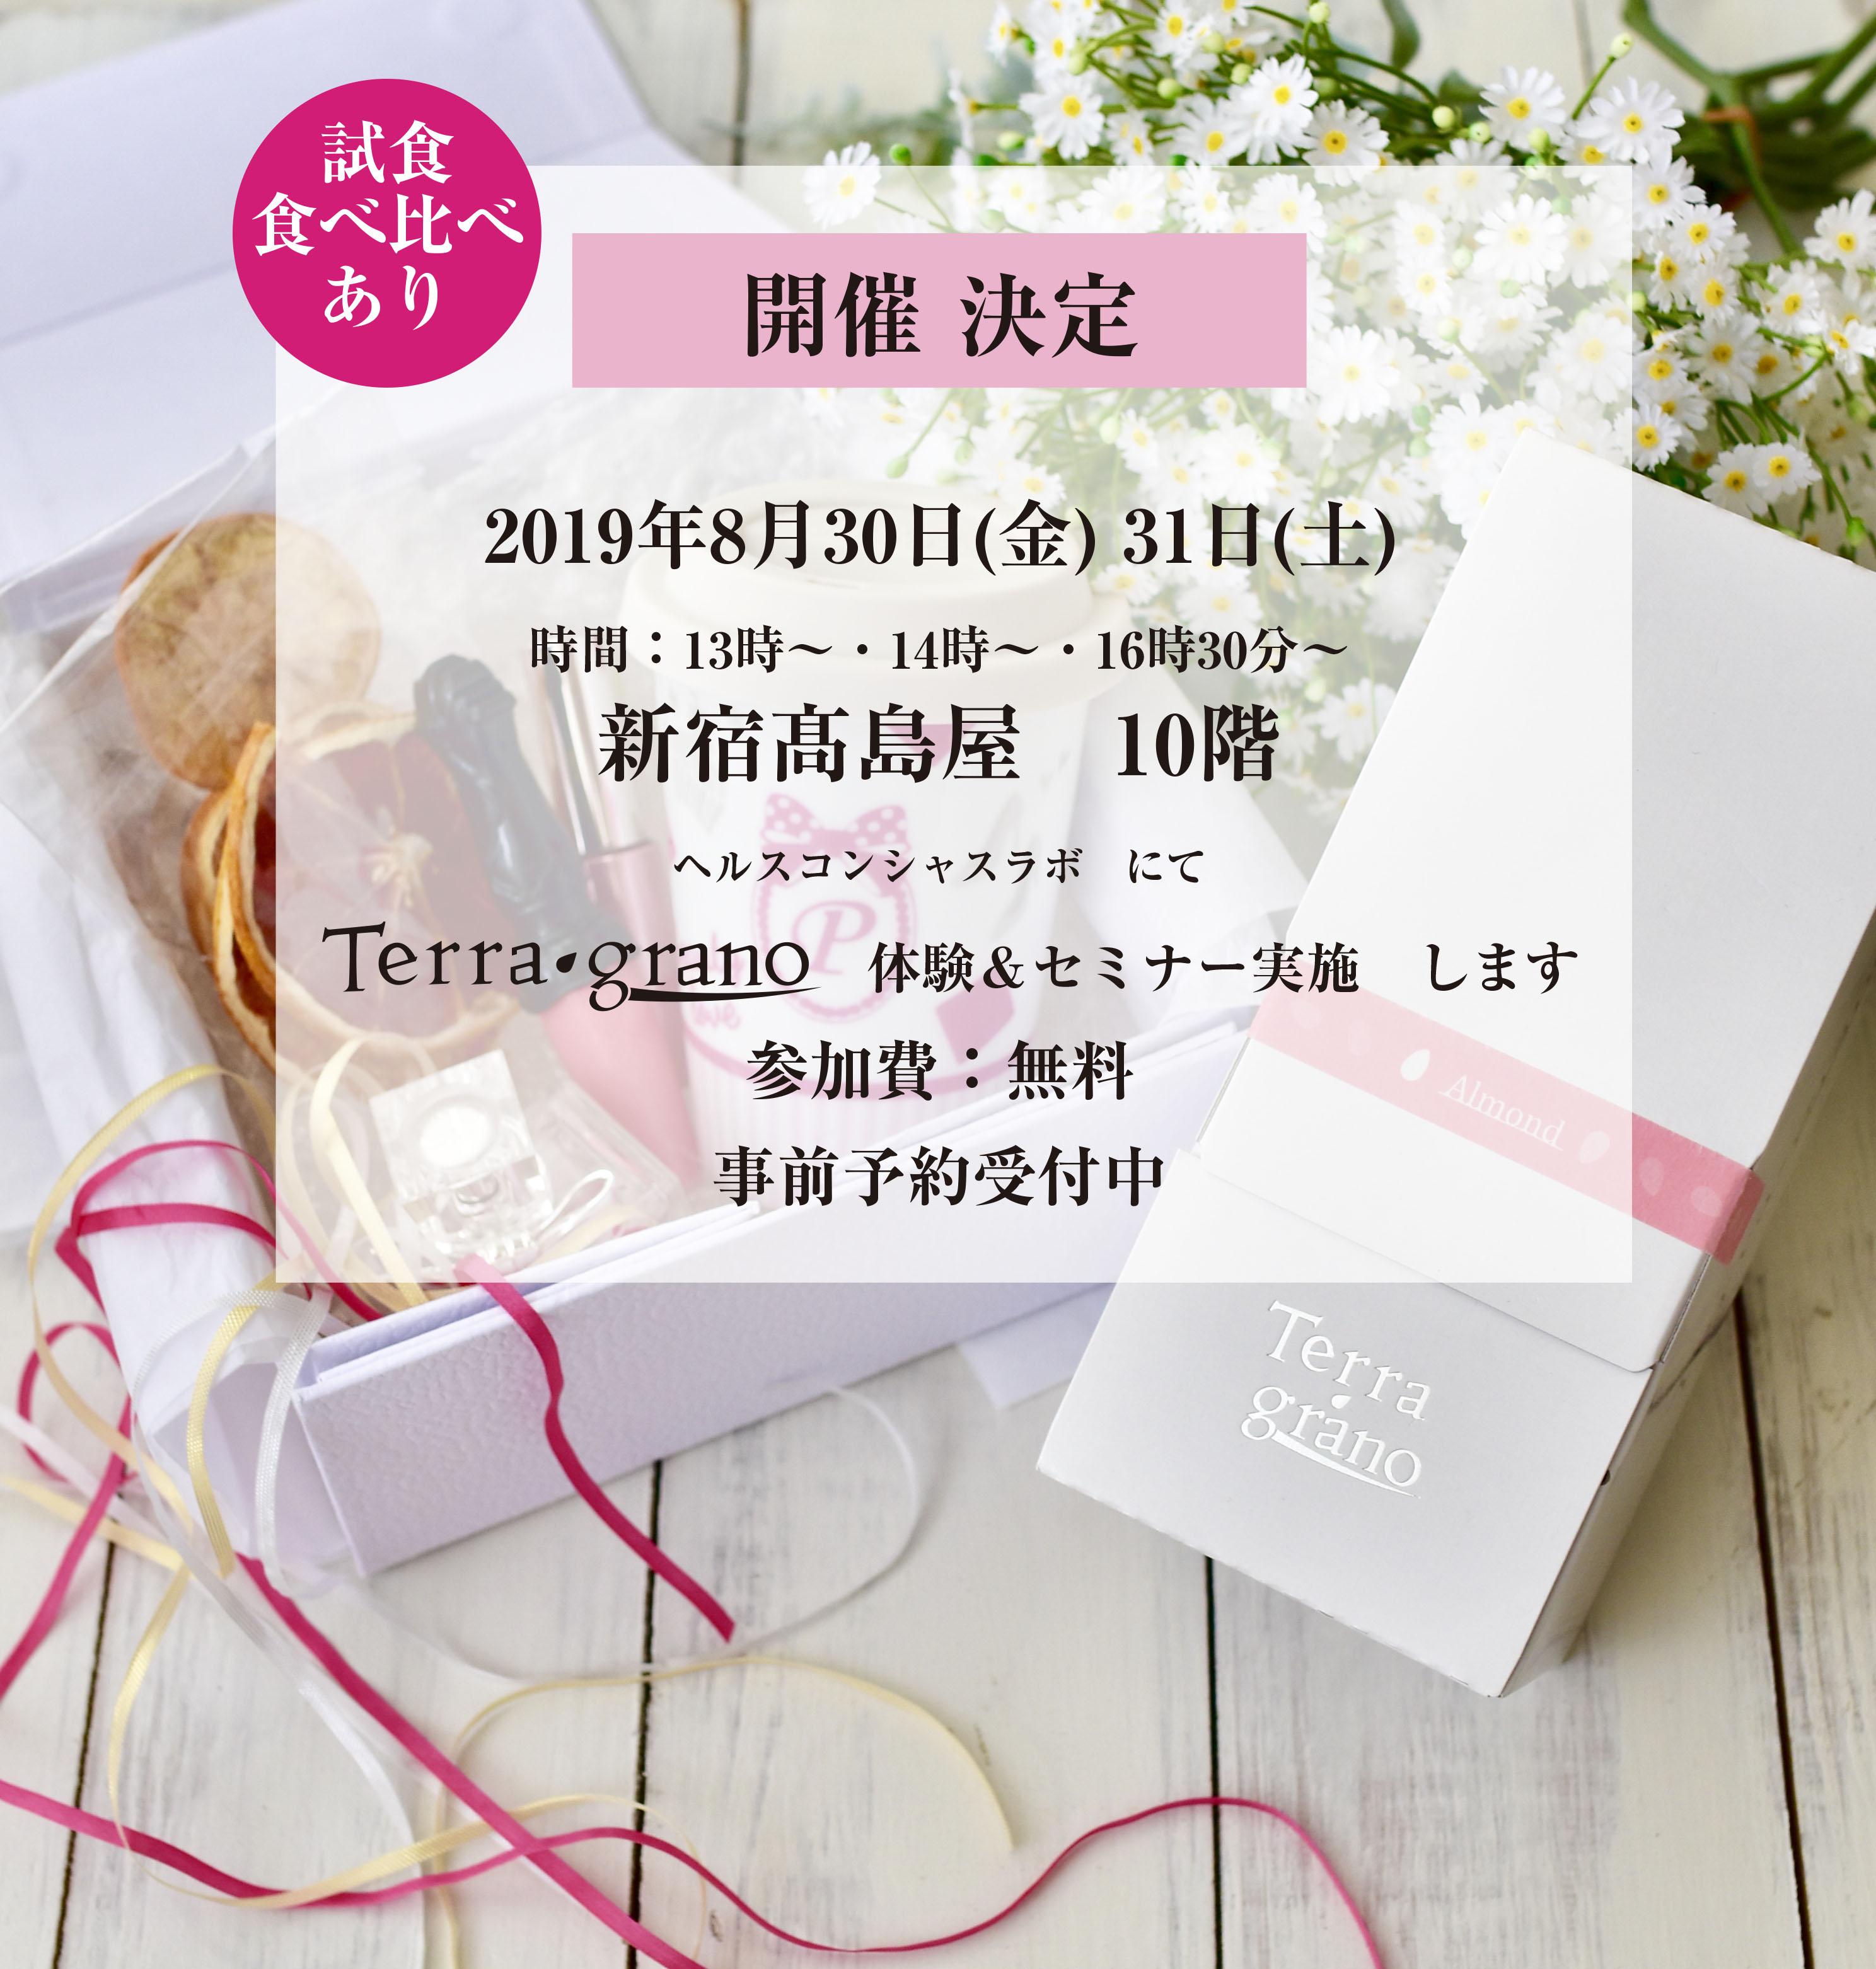 https://www.toyonut.co.jp/news/upload/%E9%AB%99%E5%B3%B6%E5%B1%8B.jpg